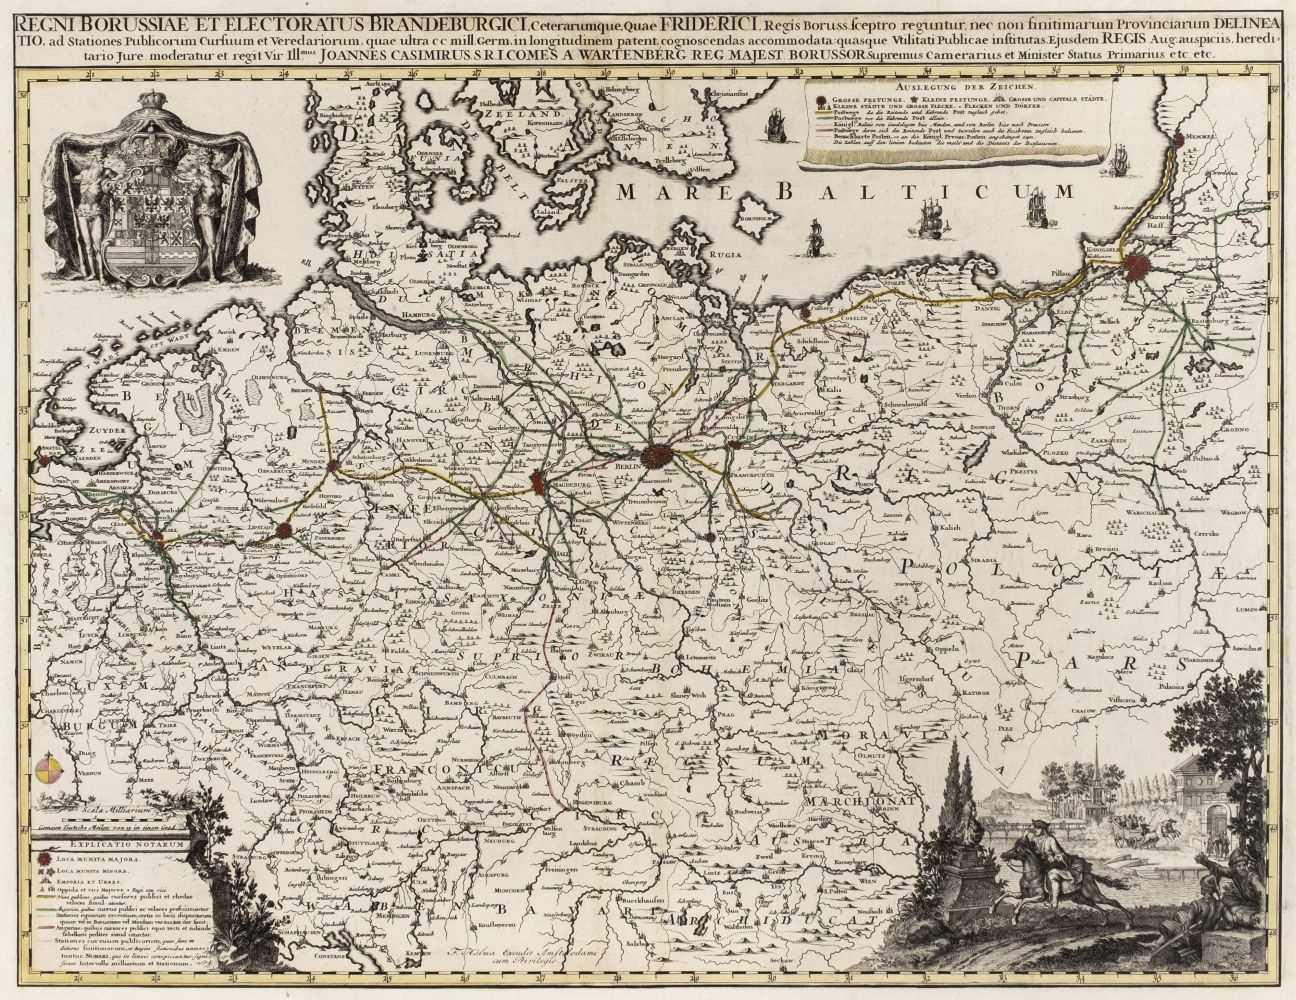 Lot 42 - Germany/Prussia. Halma (Francois), Regni Borussiae et Electoratus Brandeburgici.., circa 1700